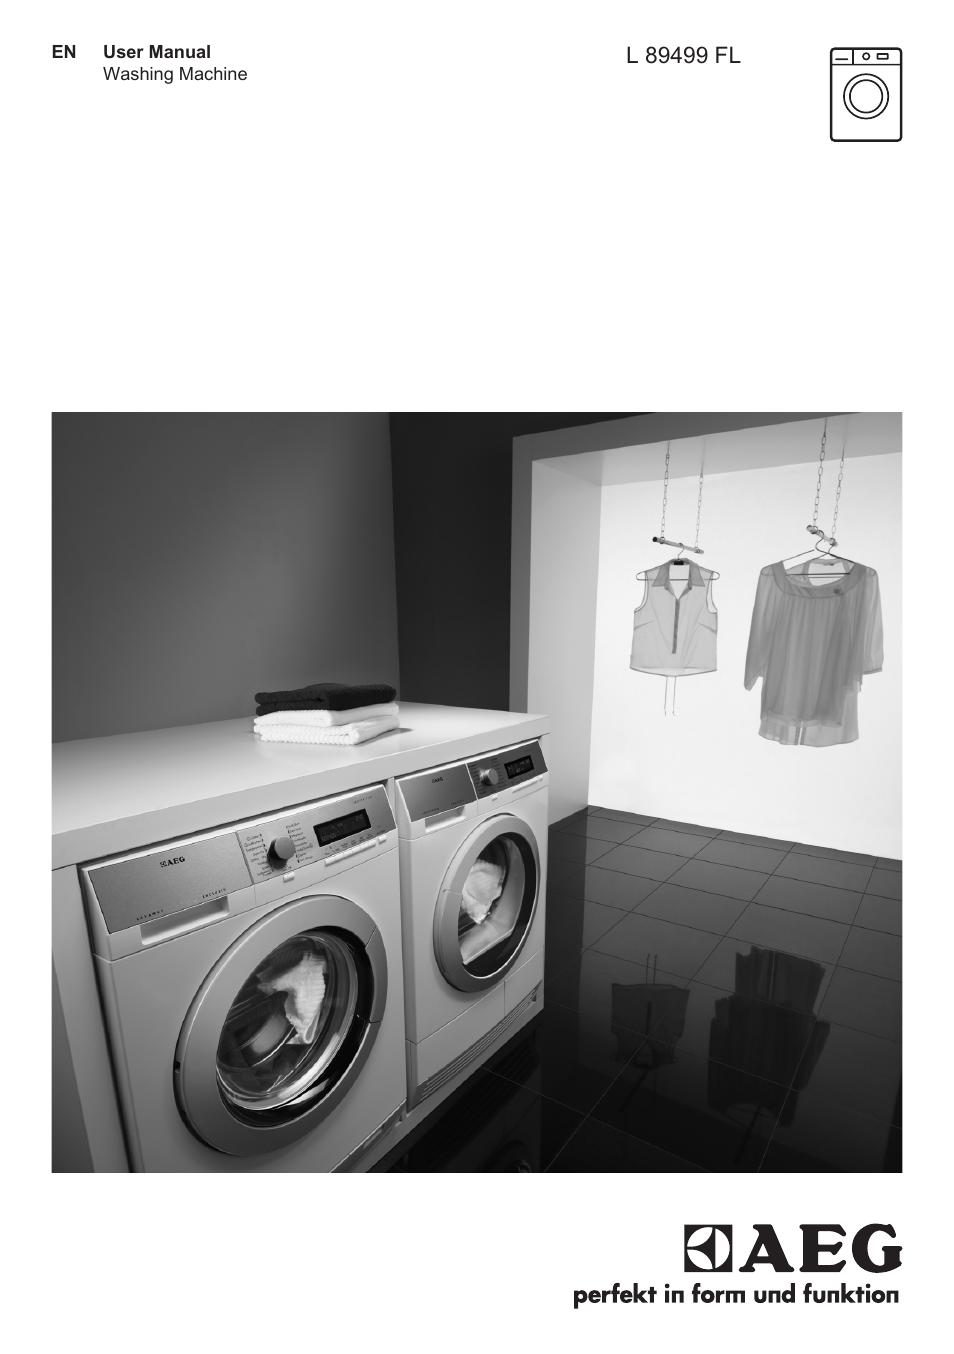 aeg l98480fl user manual 32 pages rh manualsdir com aeg lavamat washing machine user manual aeg l87480fl washing machine user manual